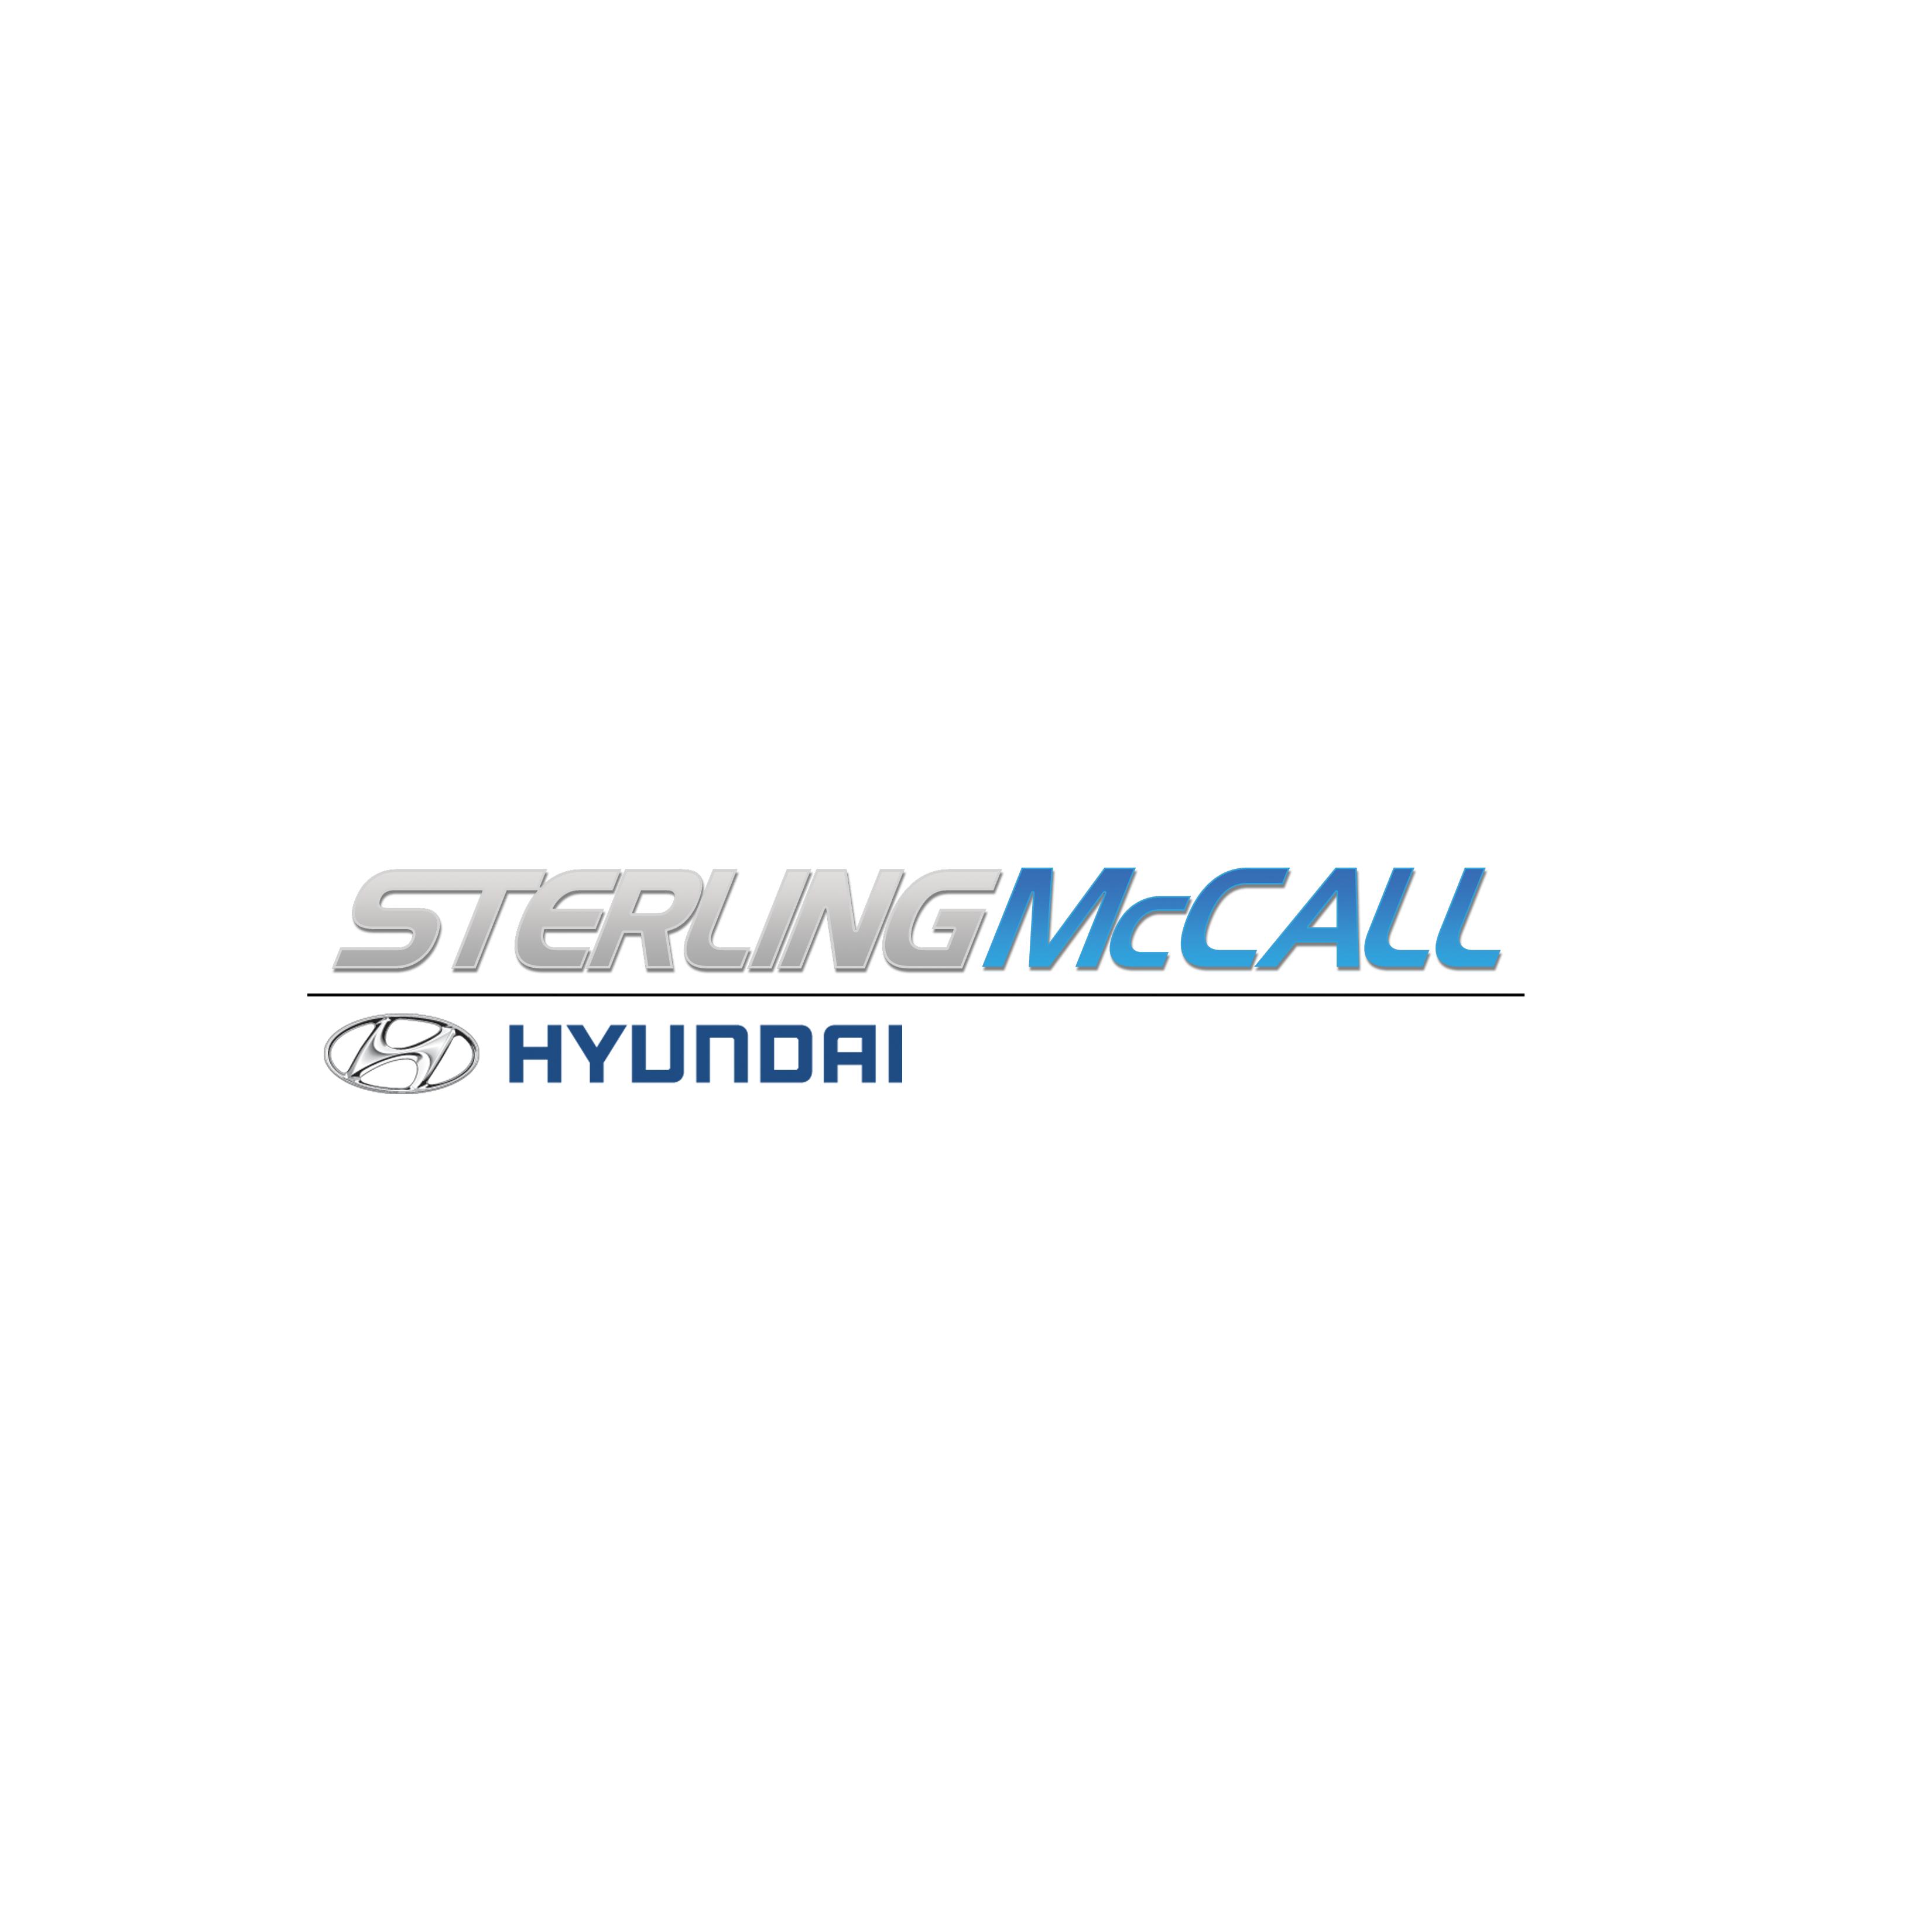 Hyundai Houston Texas: Sterling McCall Hyundai - Houston, TX